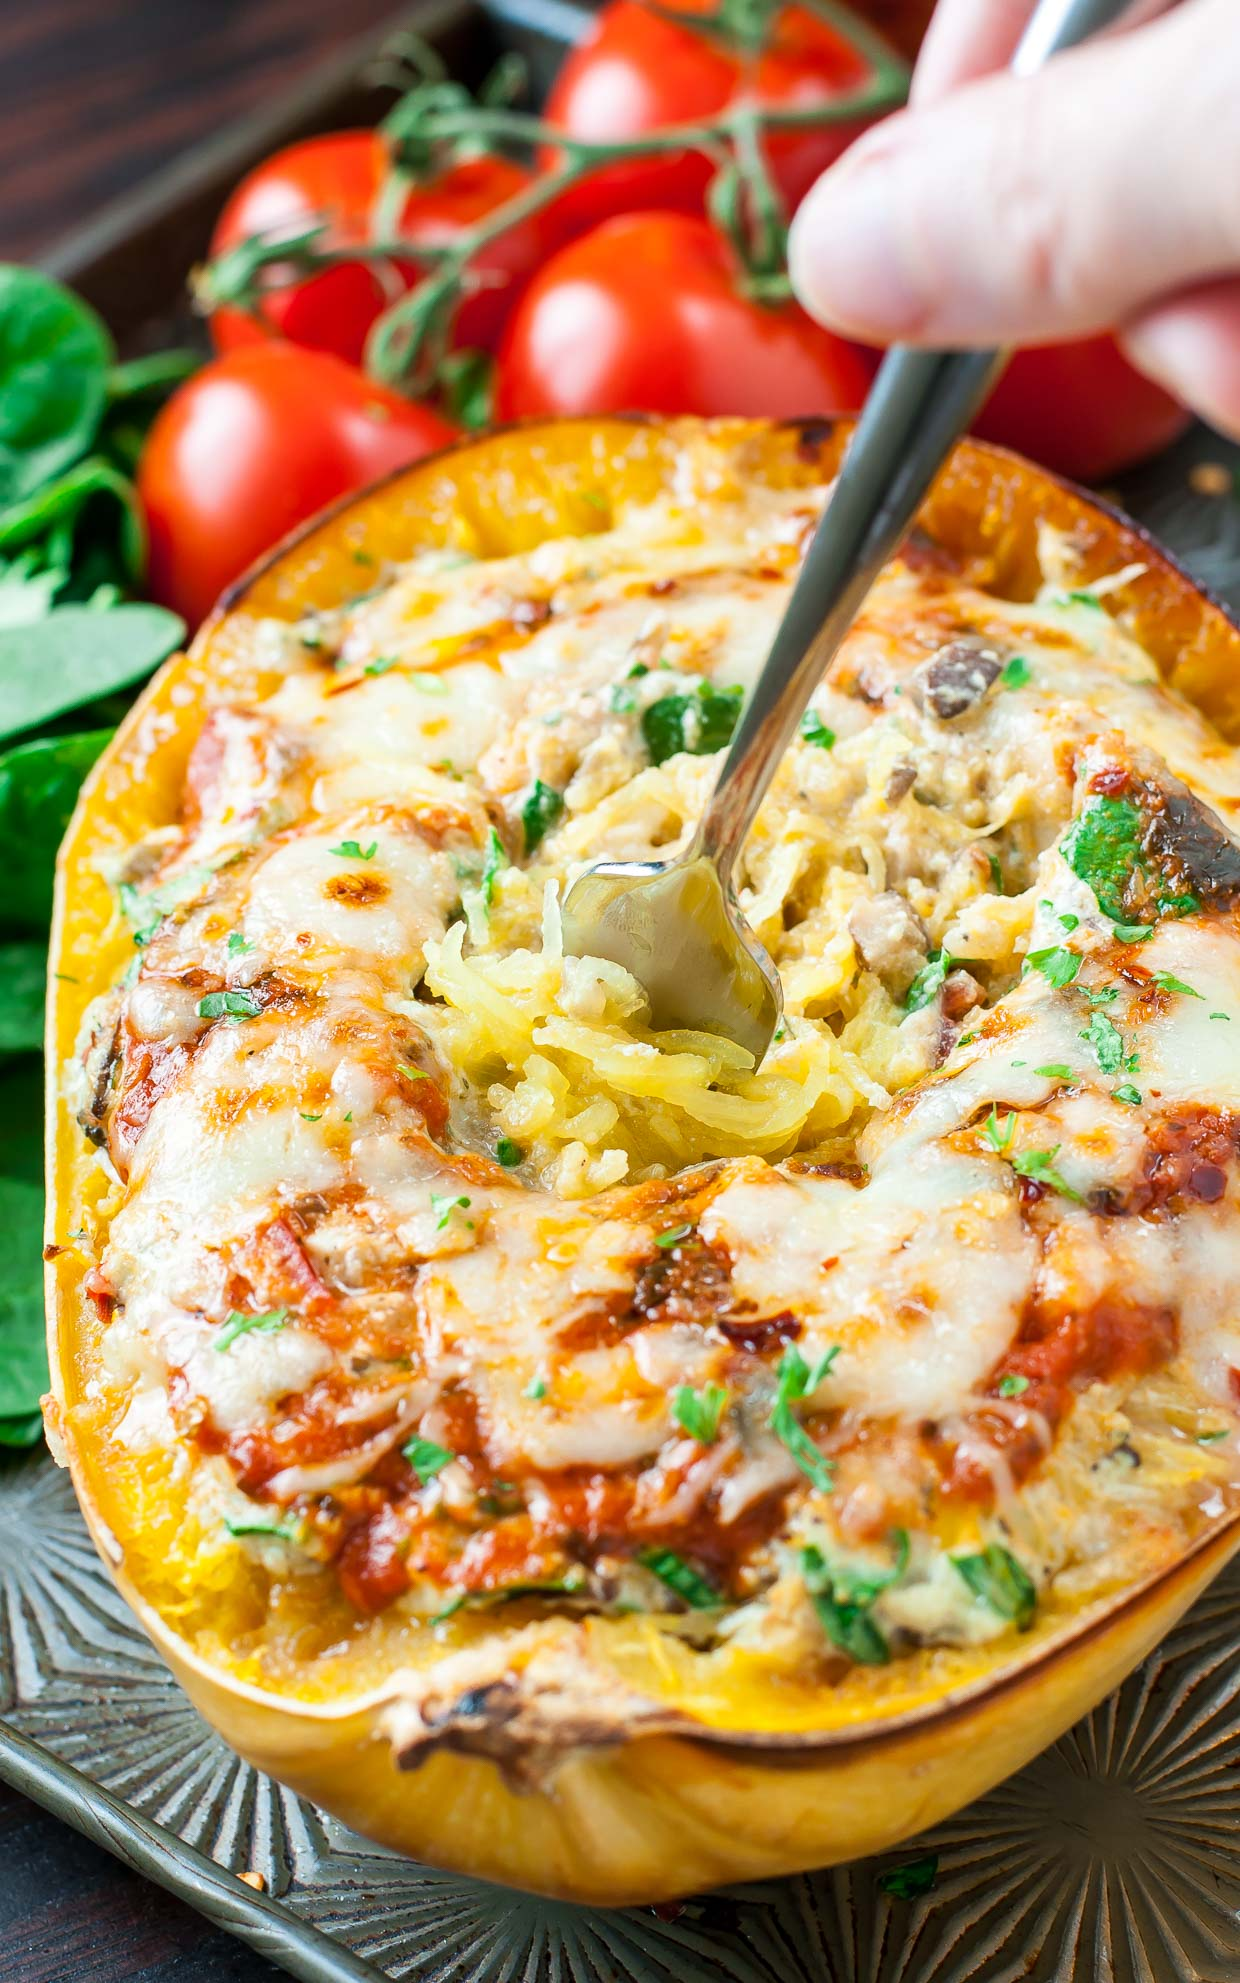 Diet Recipe for Vegetarian Spaghetti Squash Lasagna